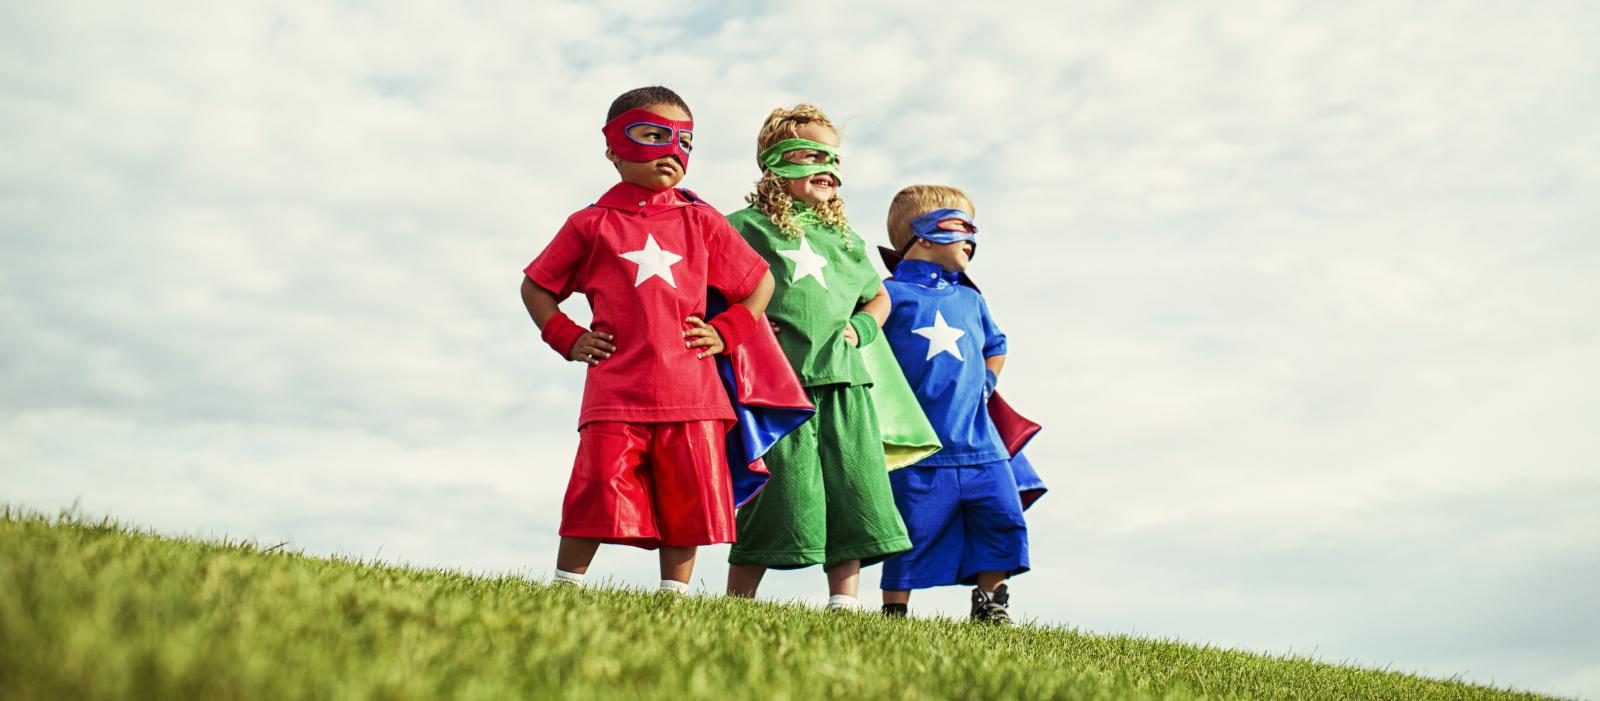 superhero-kids-day